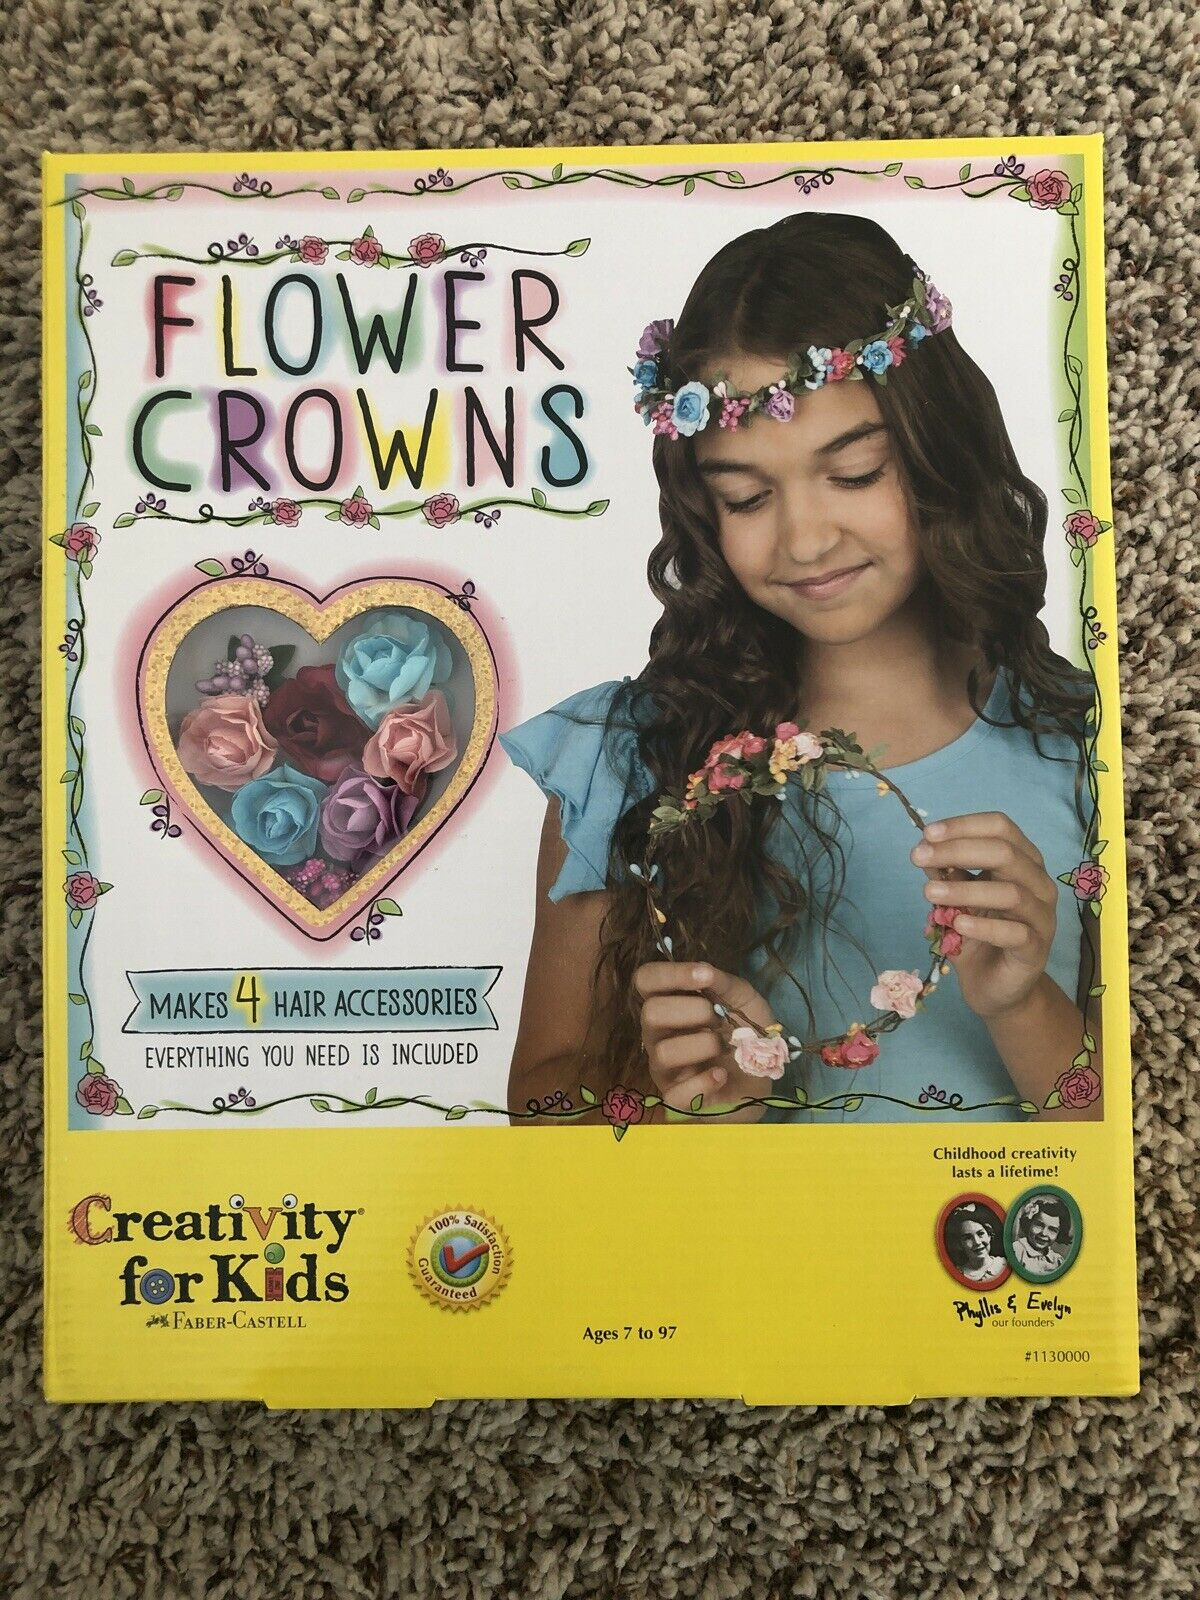 Faber-Castell 1130000 Flower Crowns